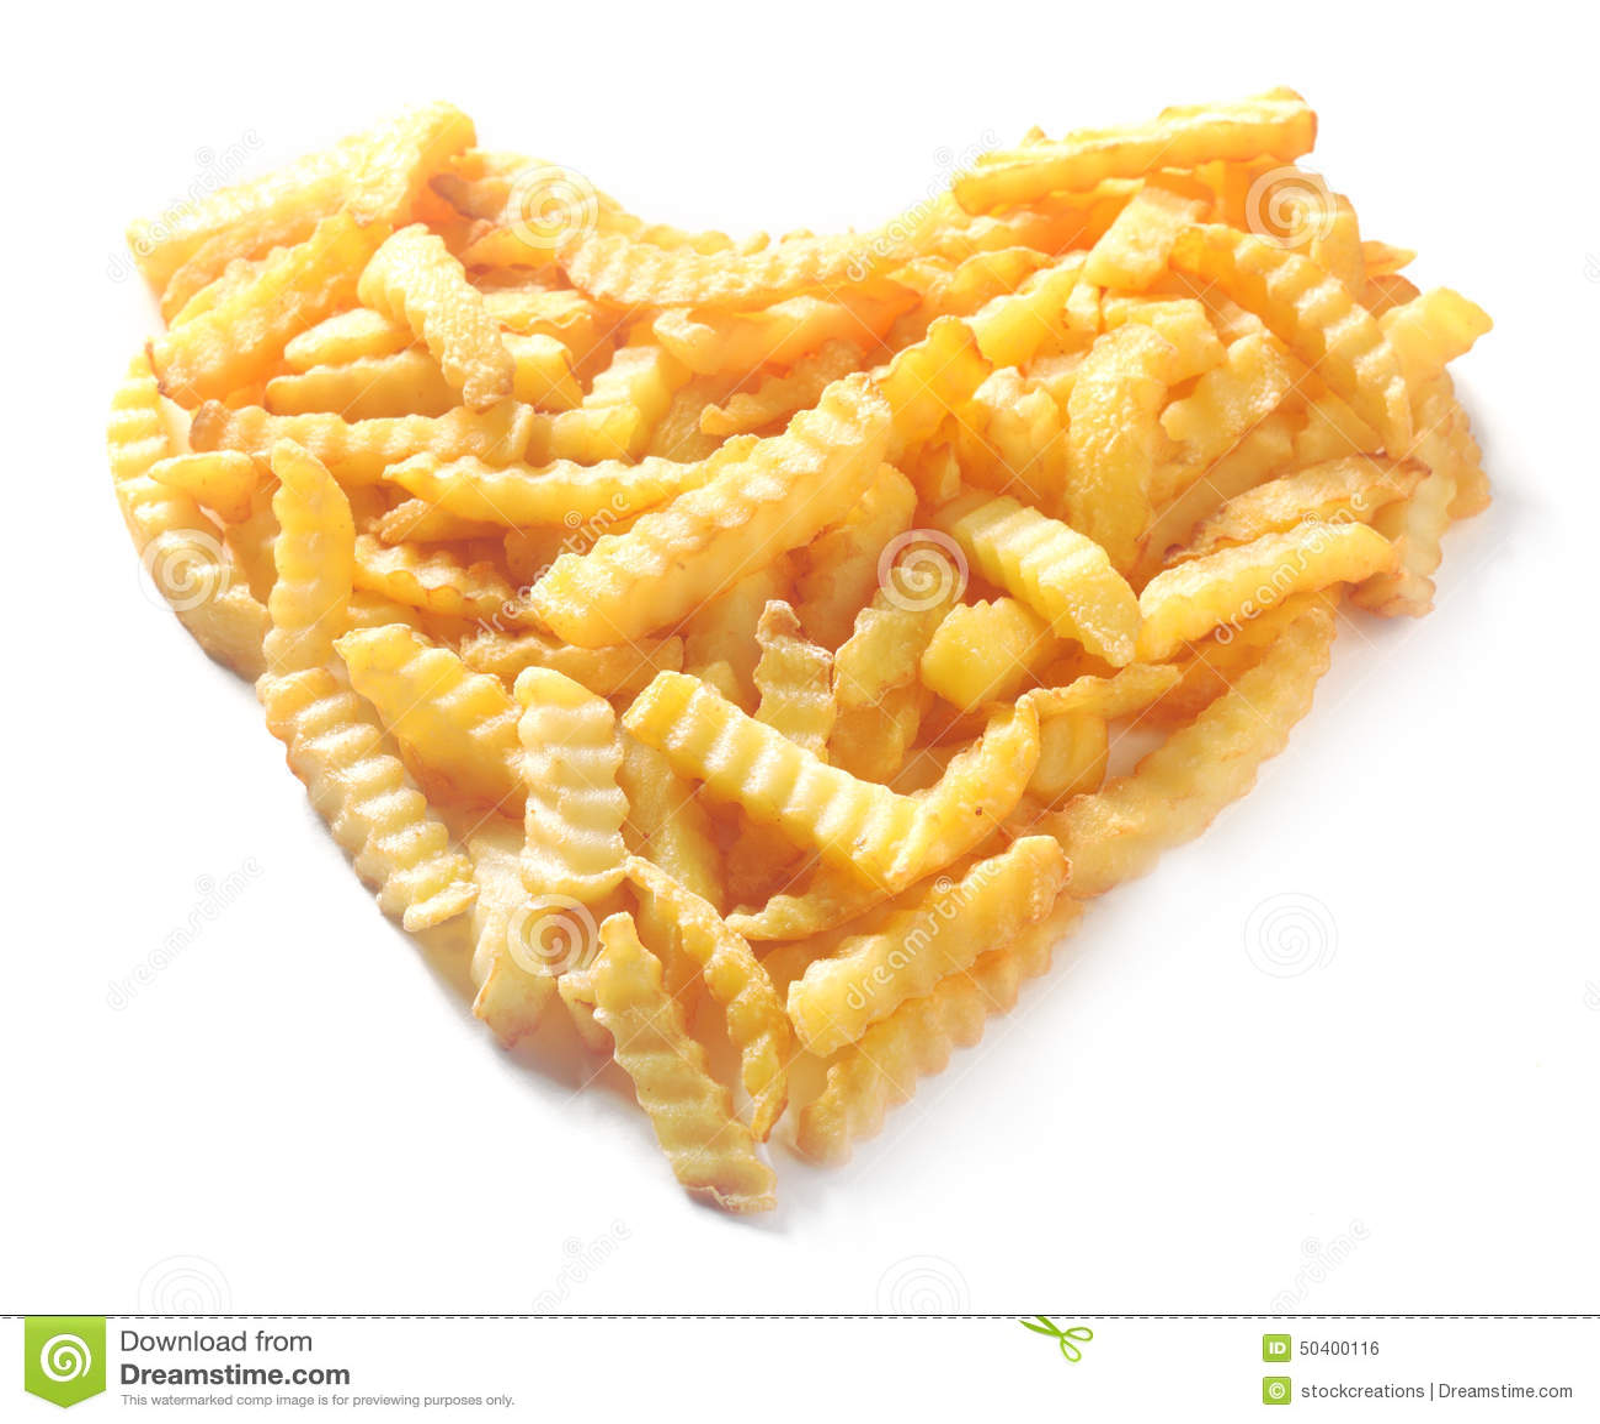 Heart Shape From Crinkle Cut Potato Chips Stock PhotoImage